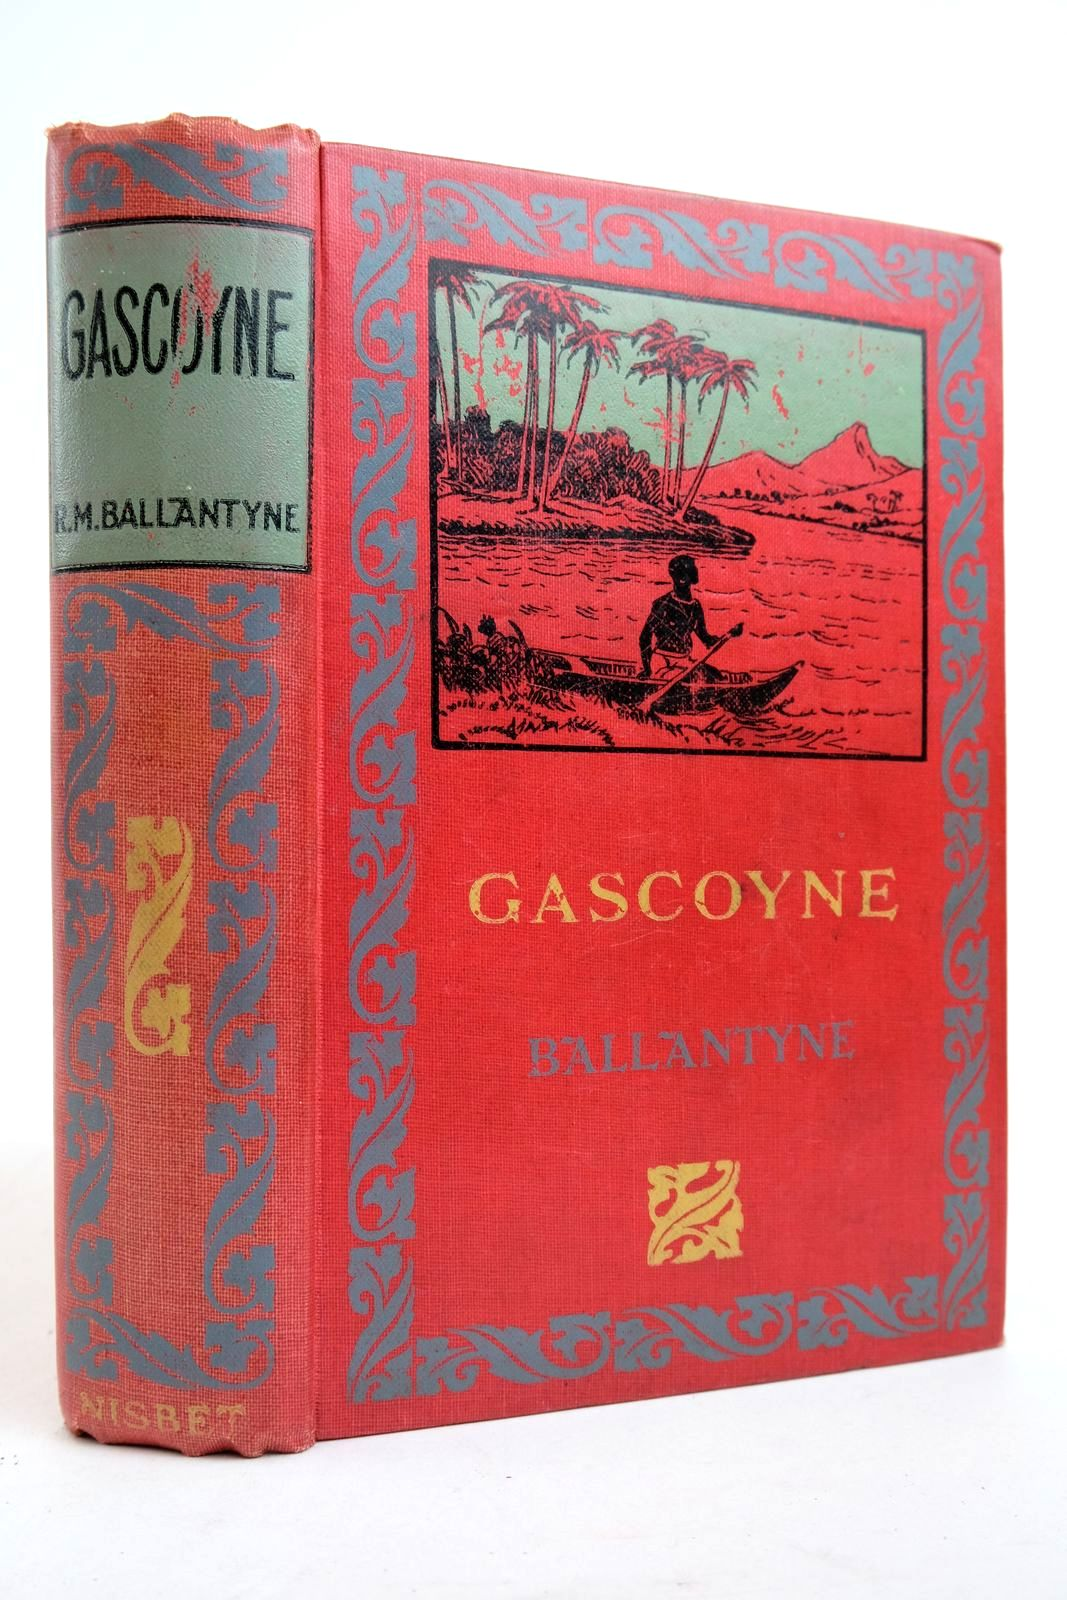 Photo of GASCOYNE THE SANDAL-WOOD TRADER- Stock Number: 2134965